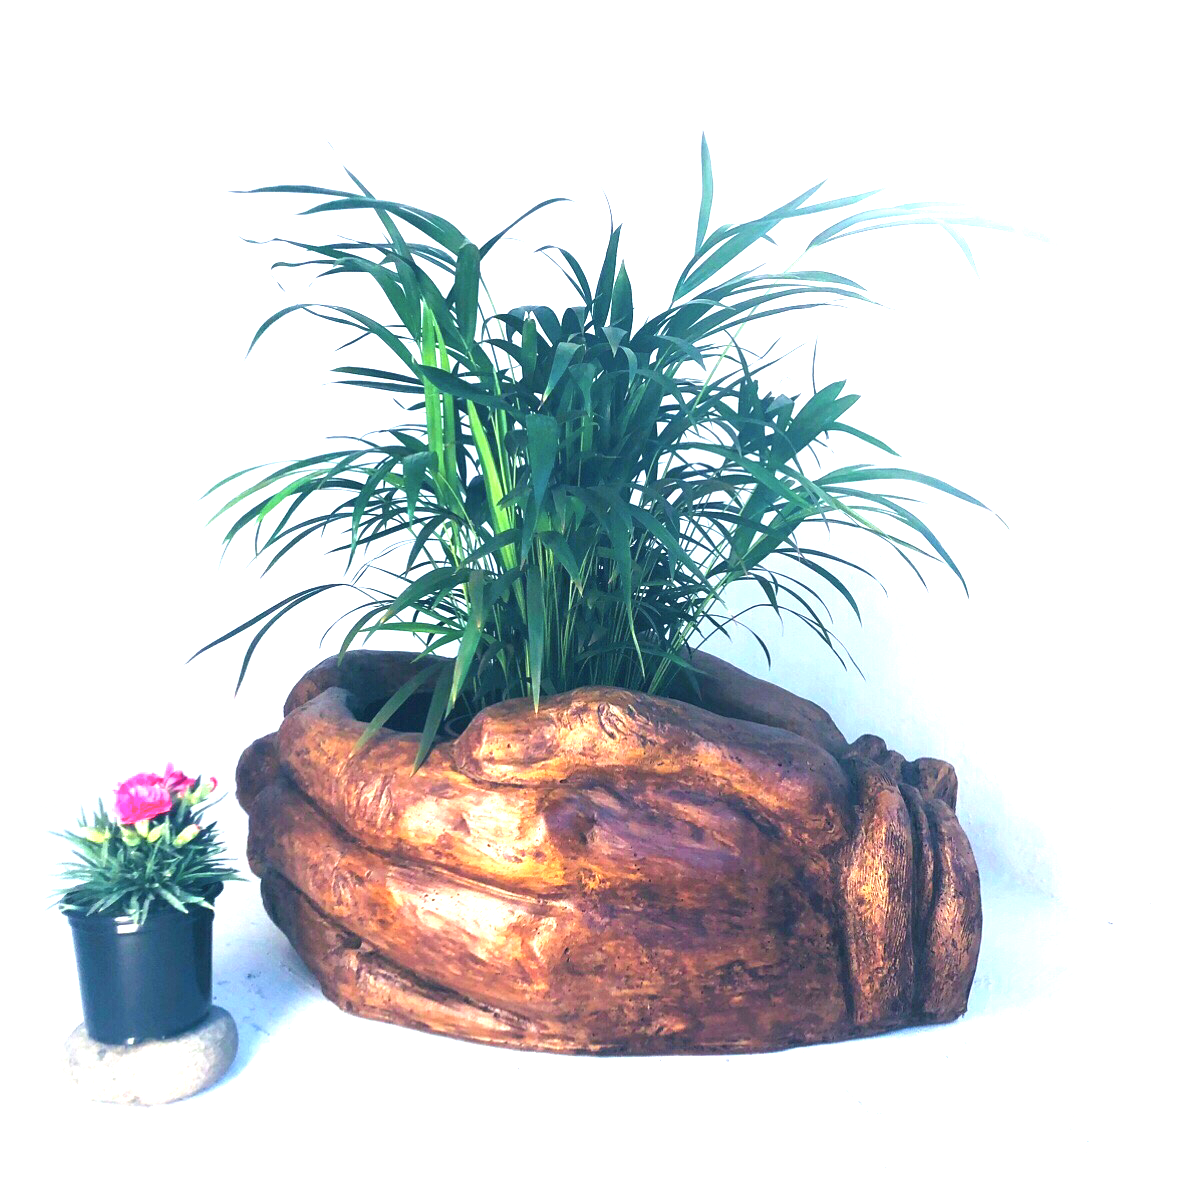 Drinking Hands Planter Honeyclay Finish - L730mm x W550mm x H170mm - 29kg